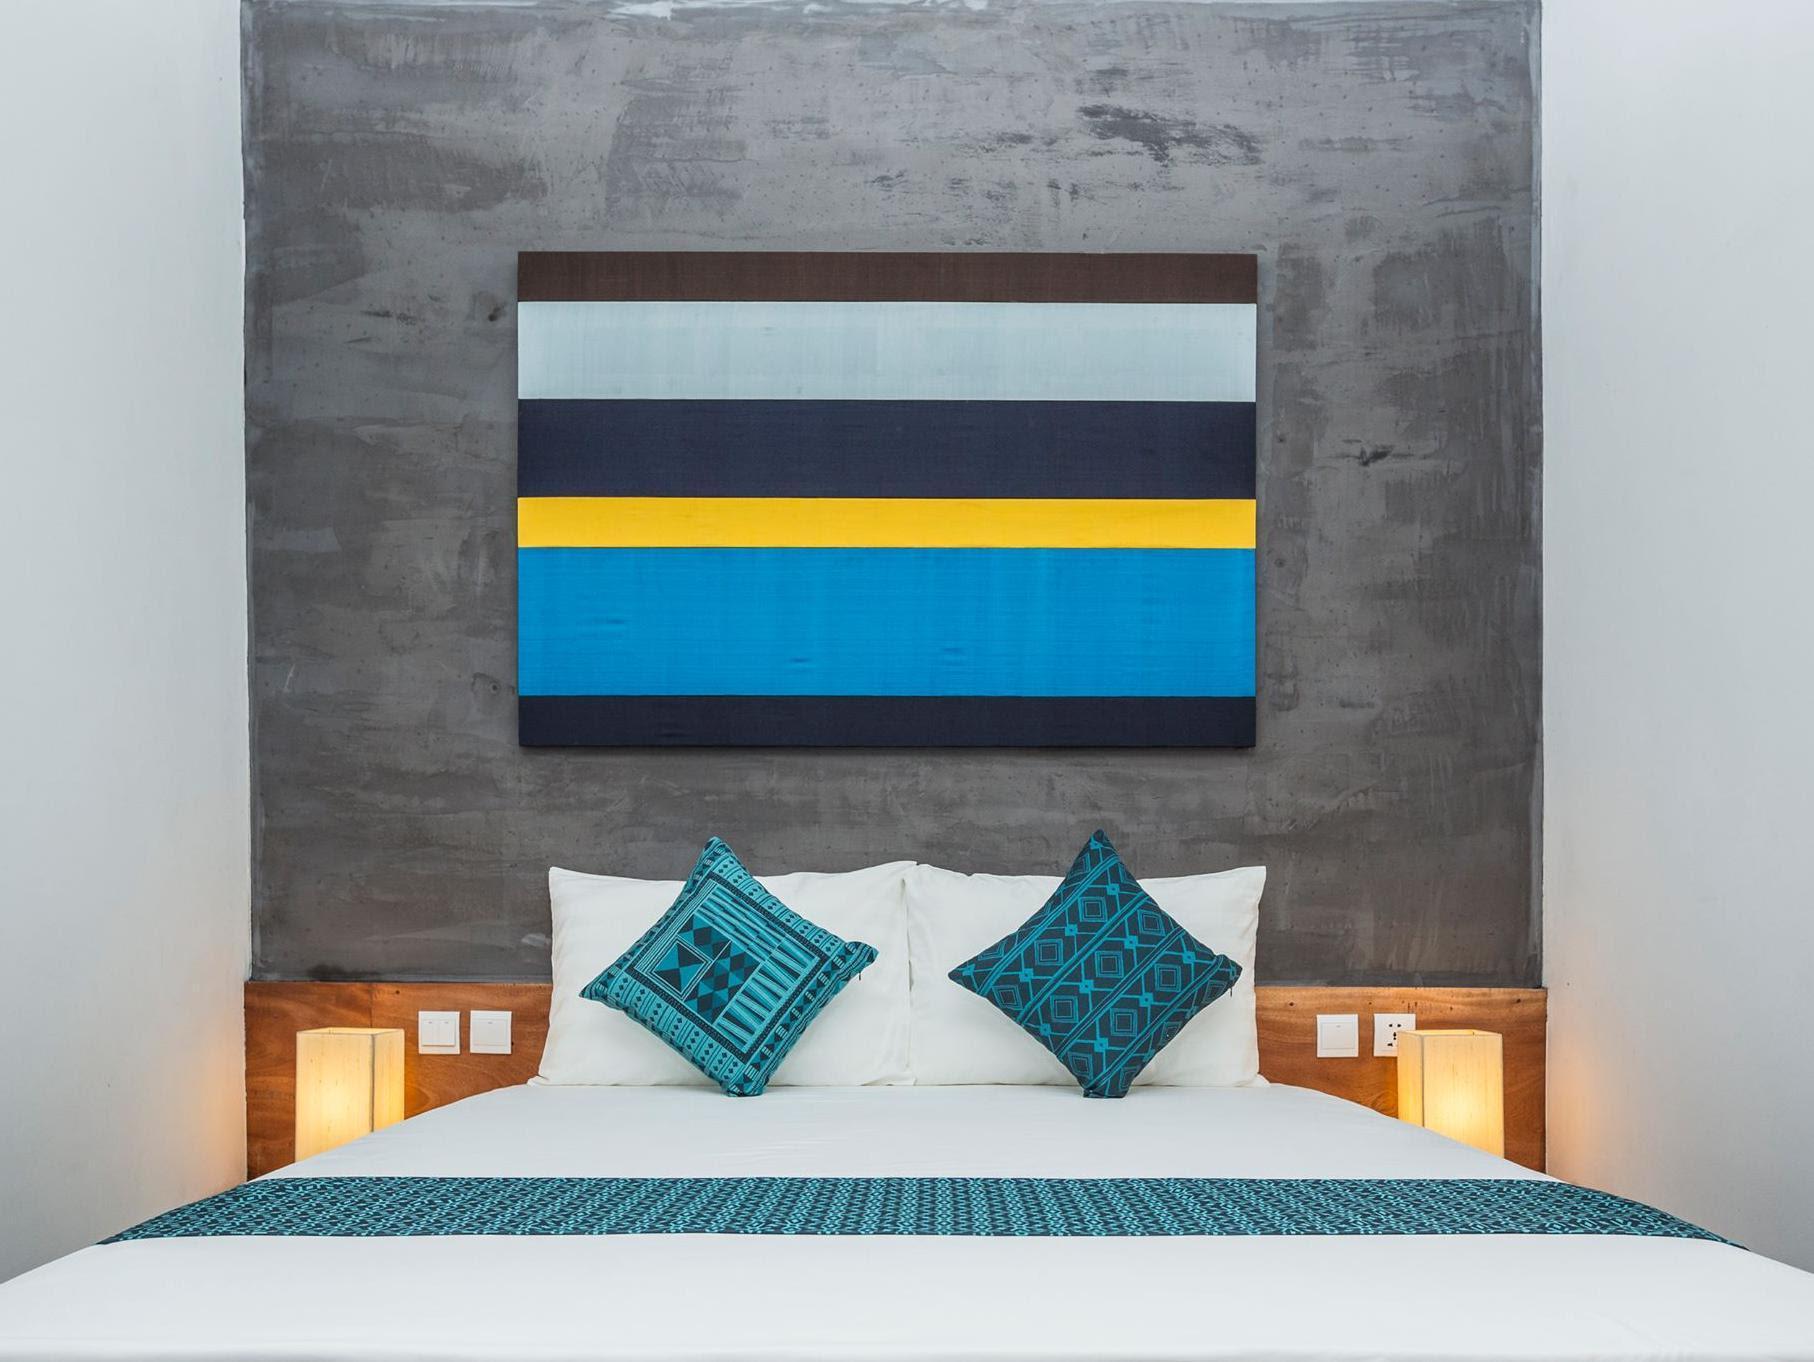 Price Patio Hotel & Urban Resort